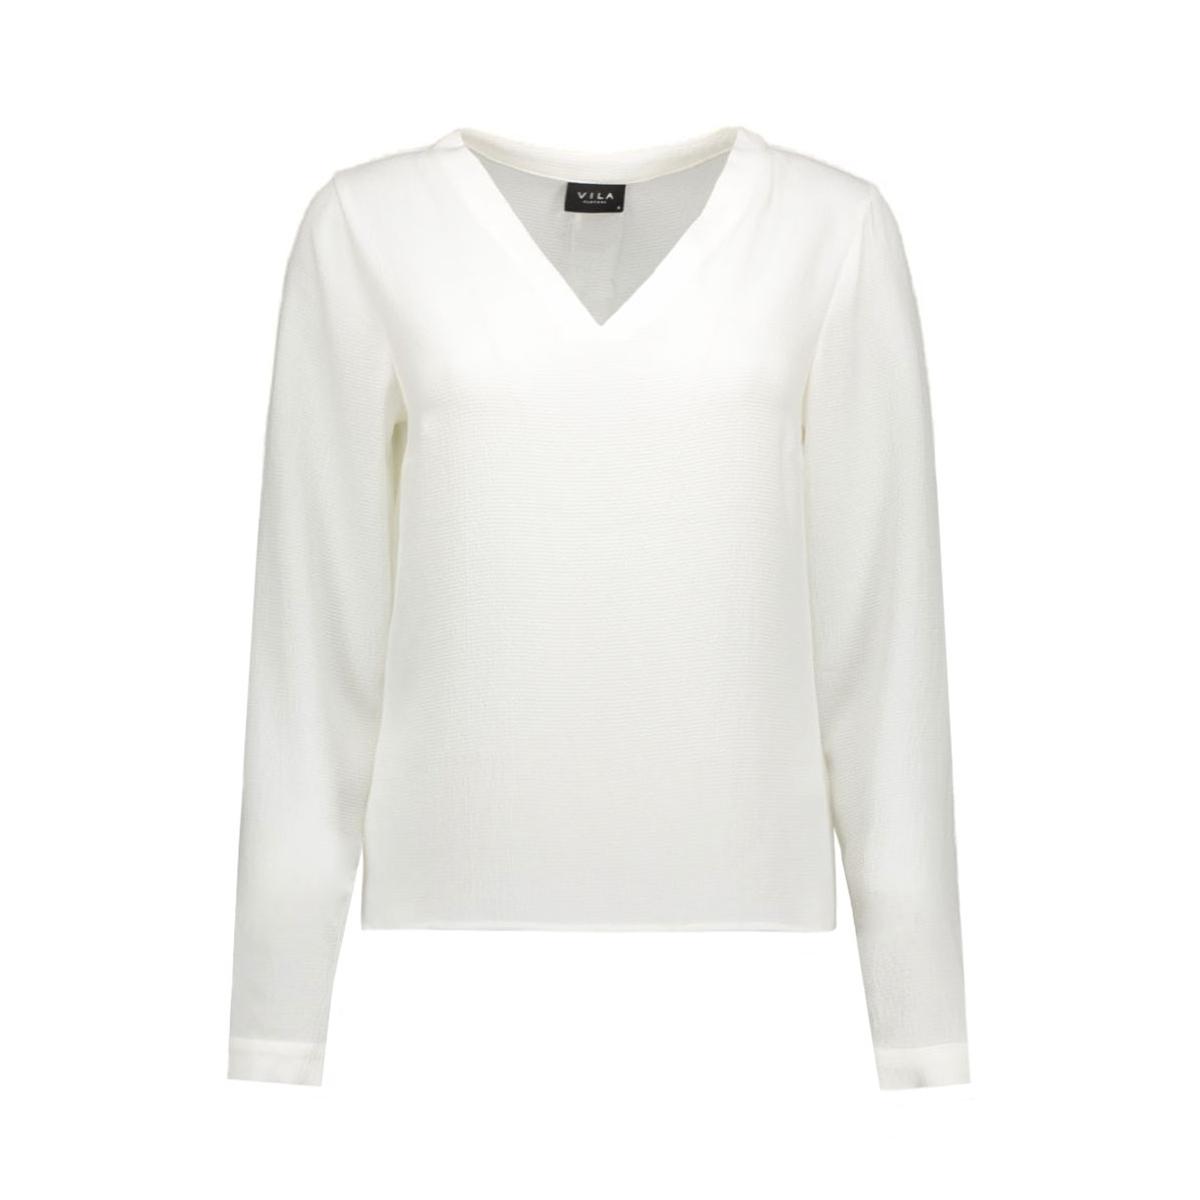 viremember l/s top-noos 14036047 vila blouse snow white